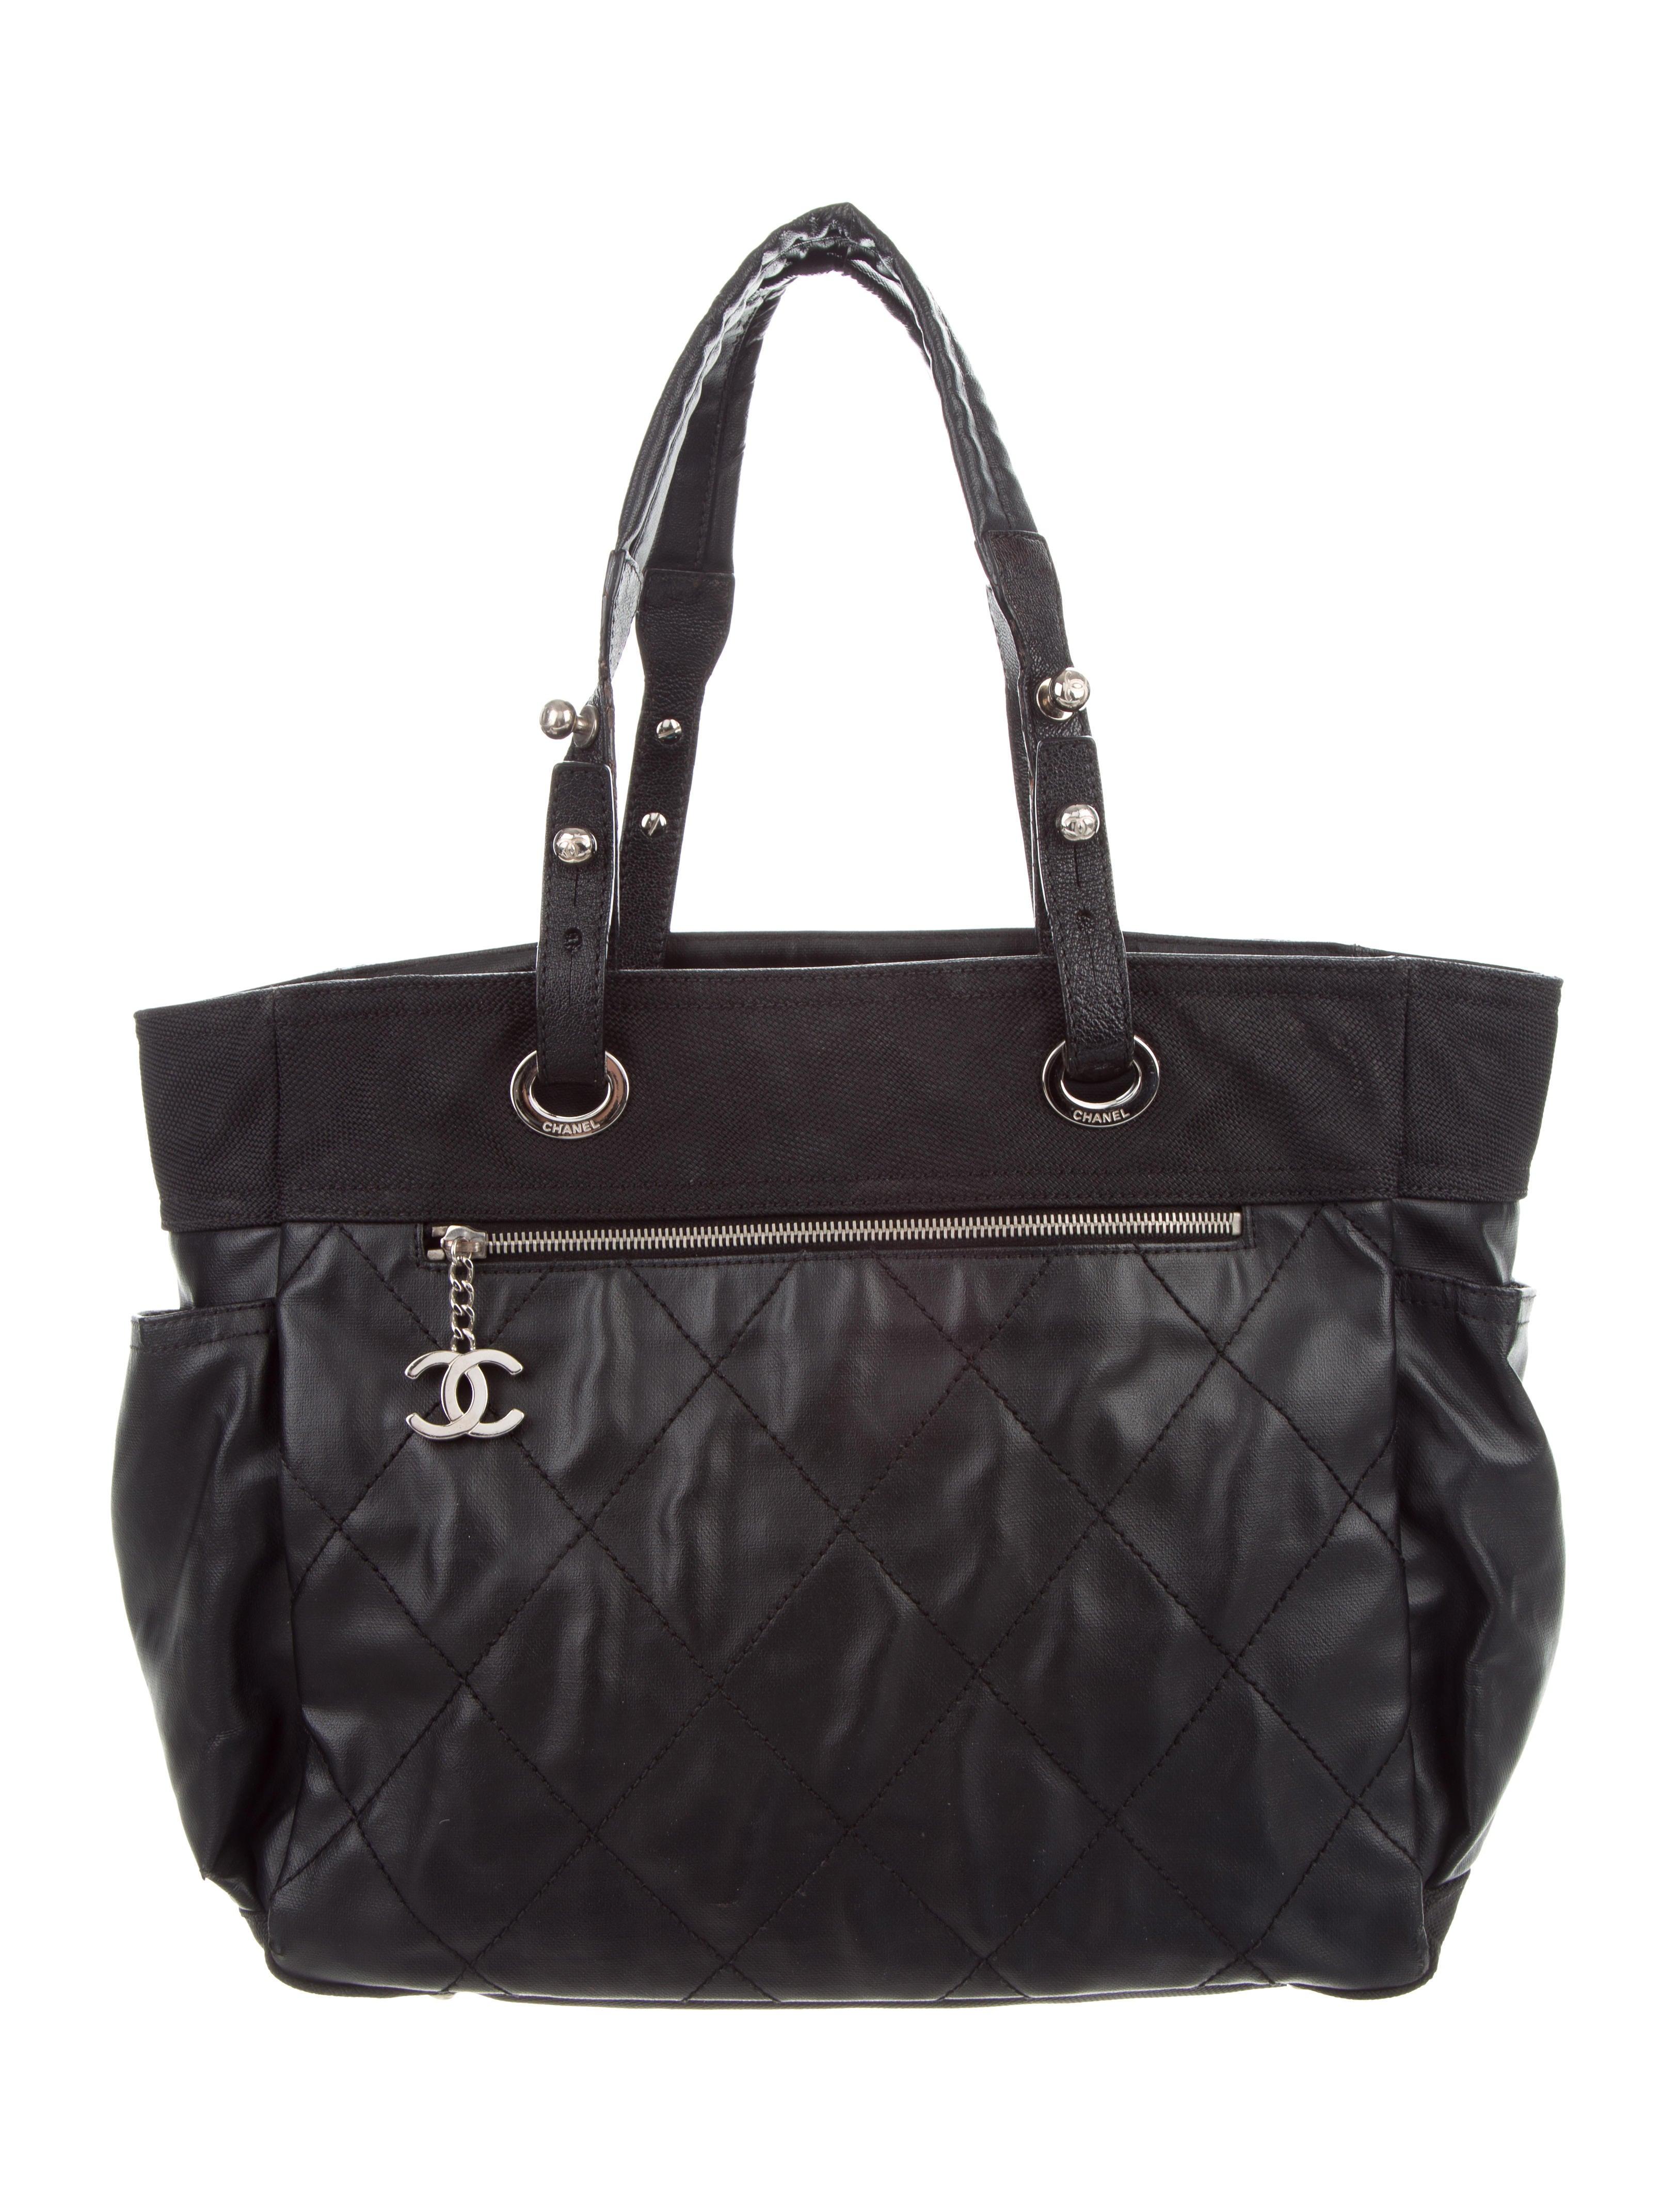 Chanel Handbags  43ab1a4f82